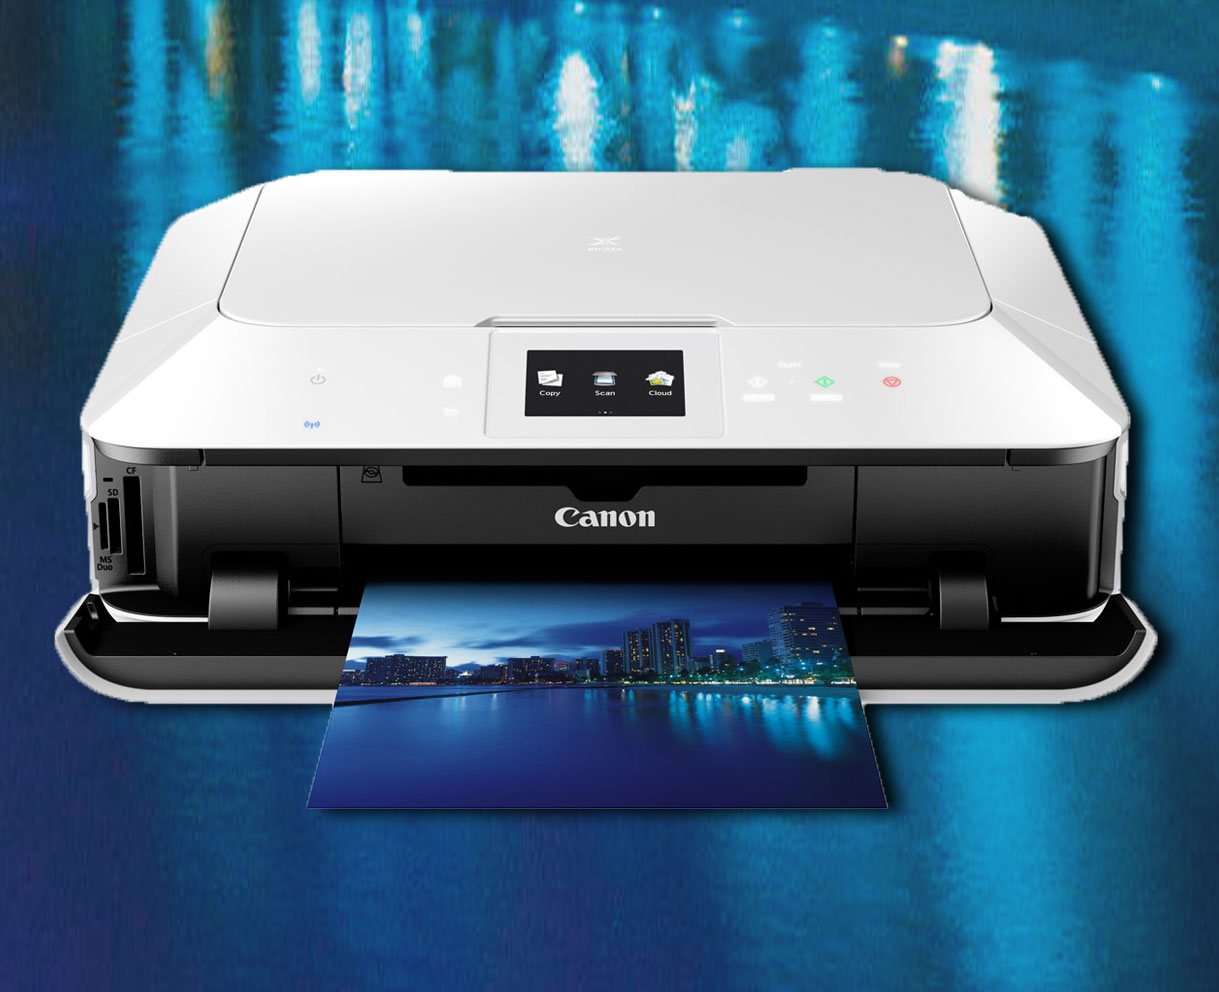 Impressoras. Pixma MG7150, da Canon